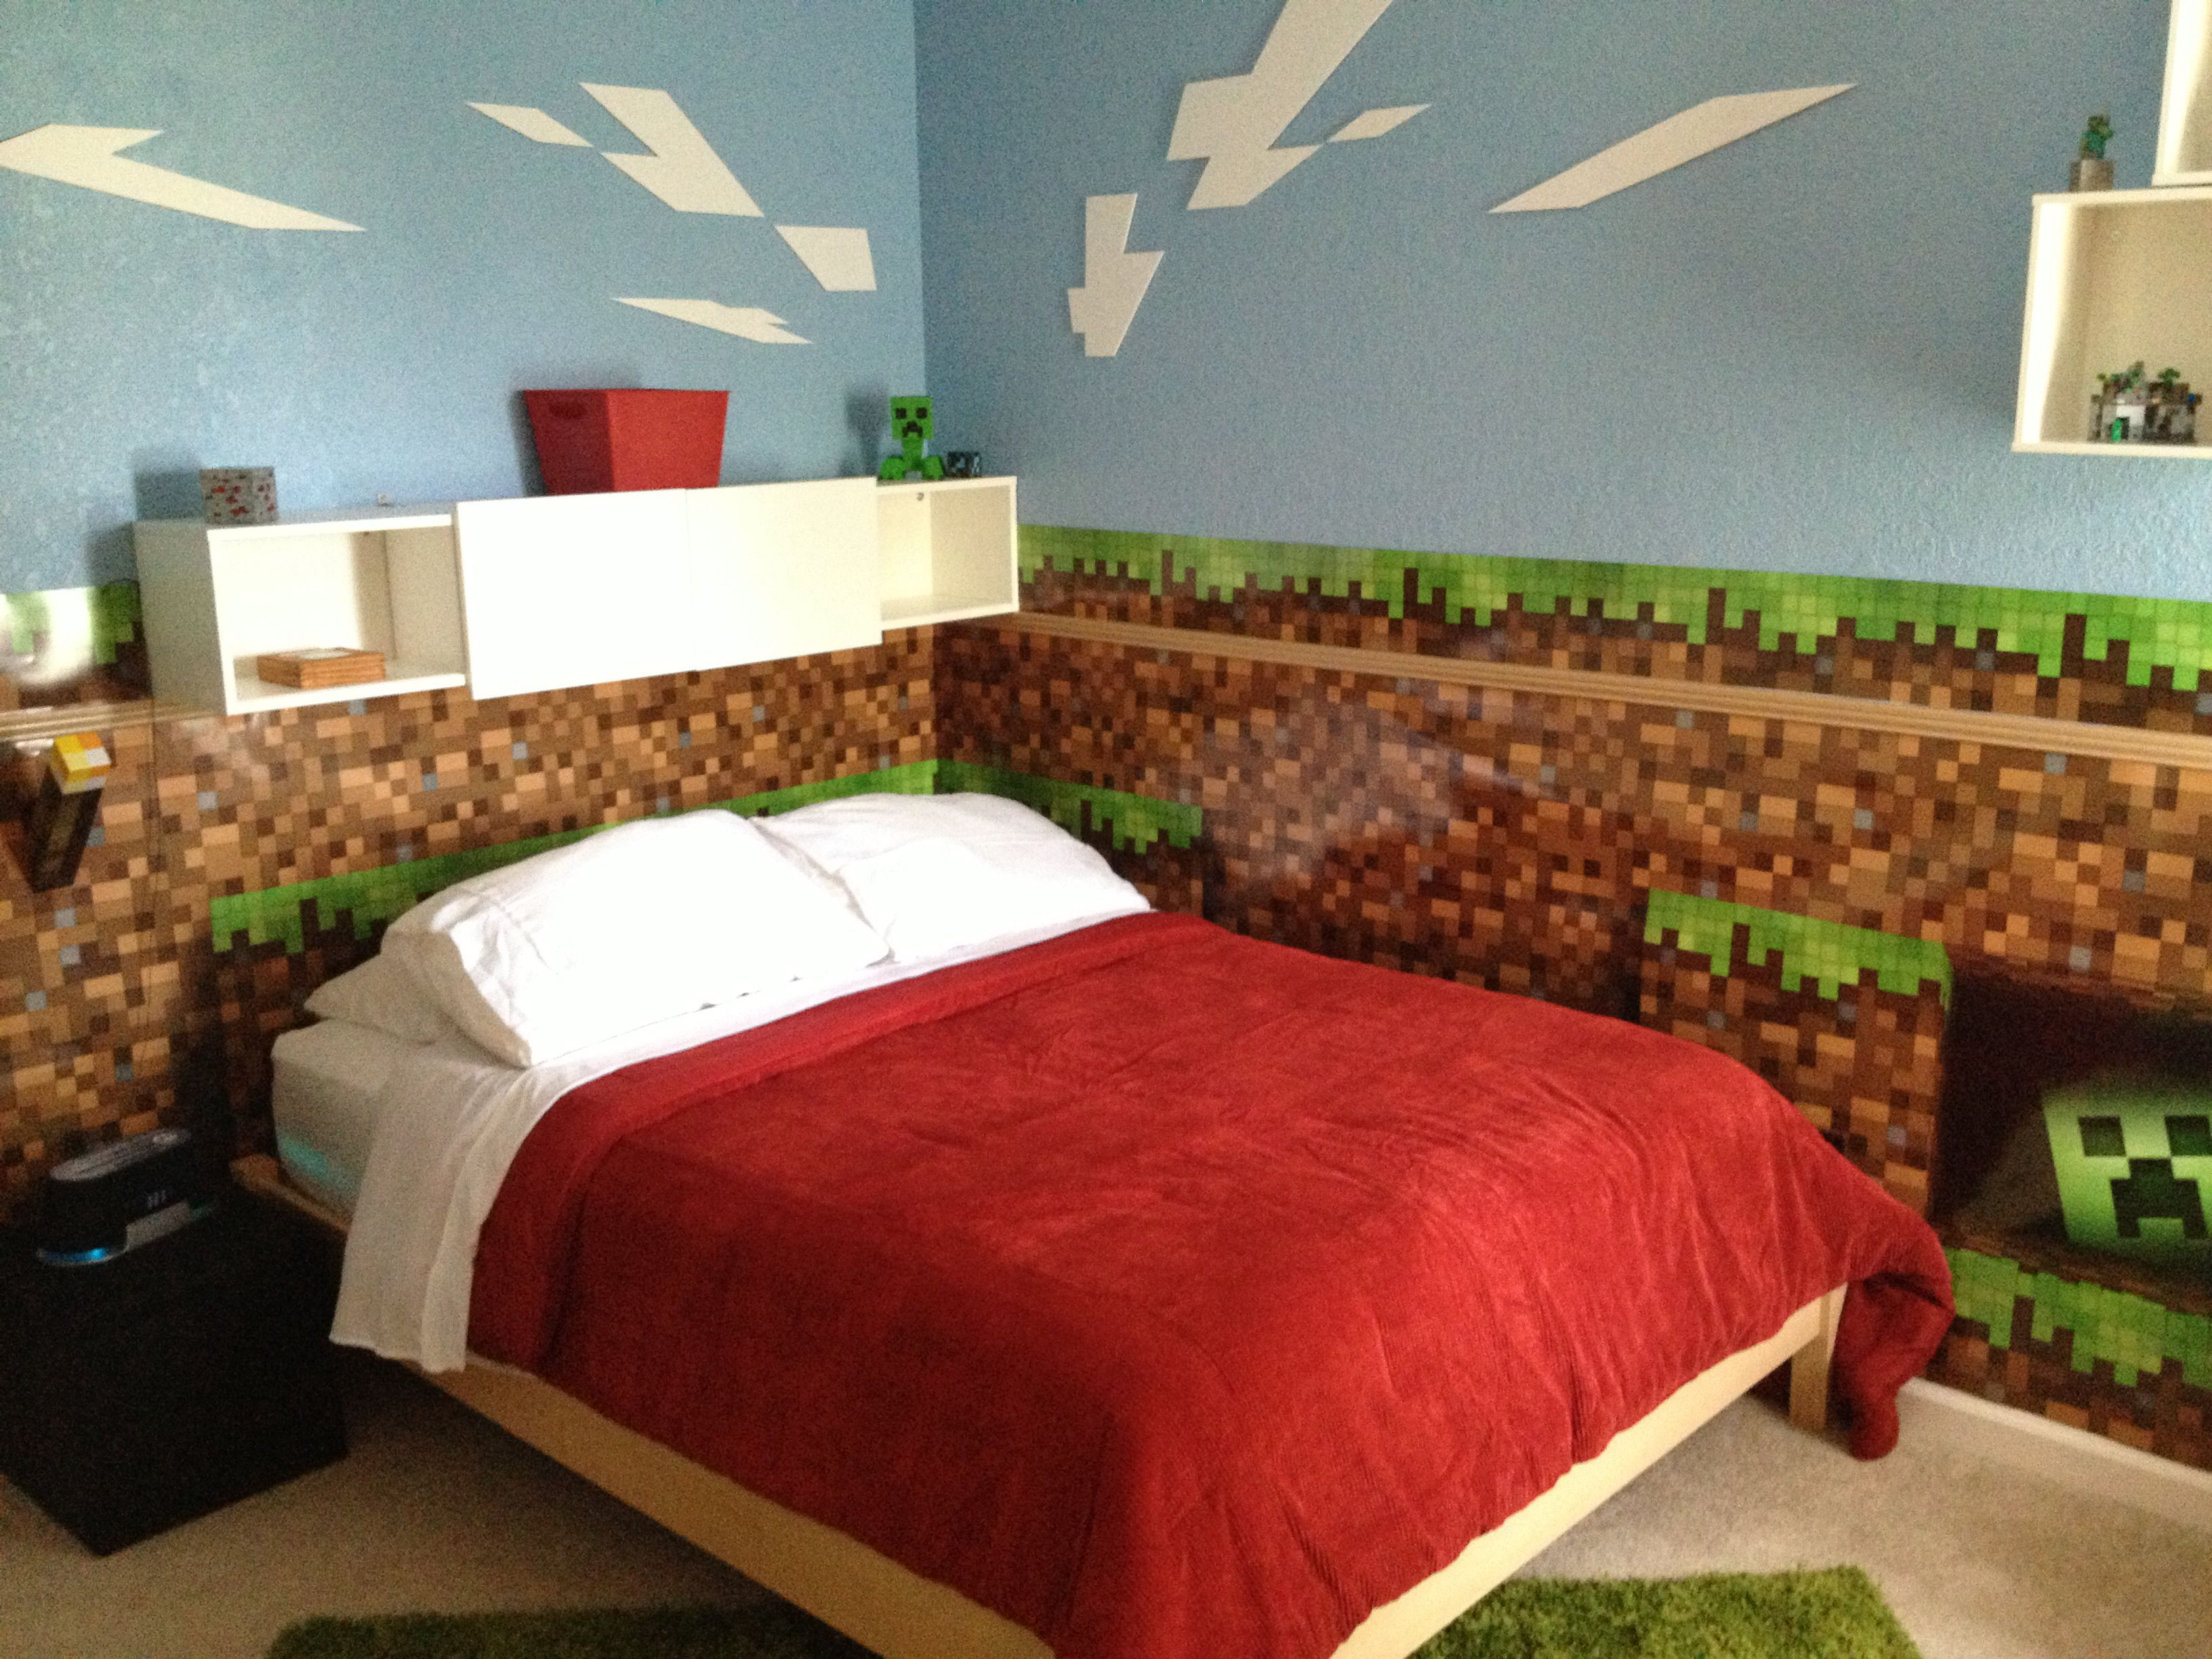 Amazing minecraft bedroom decor ideas chambre minecraft for Minecraft meuble